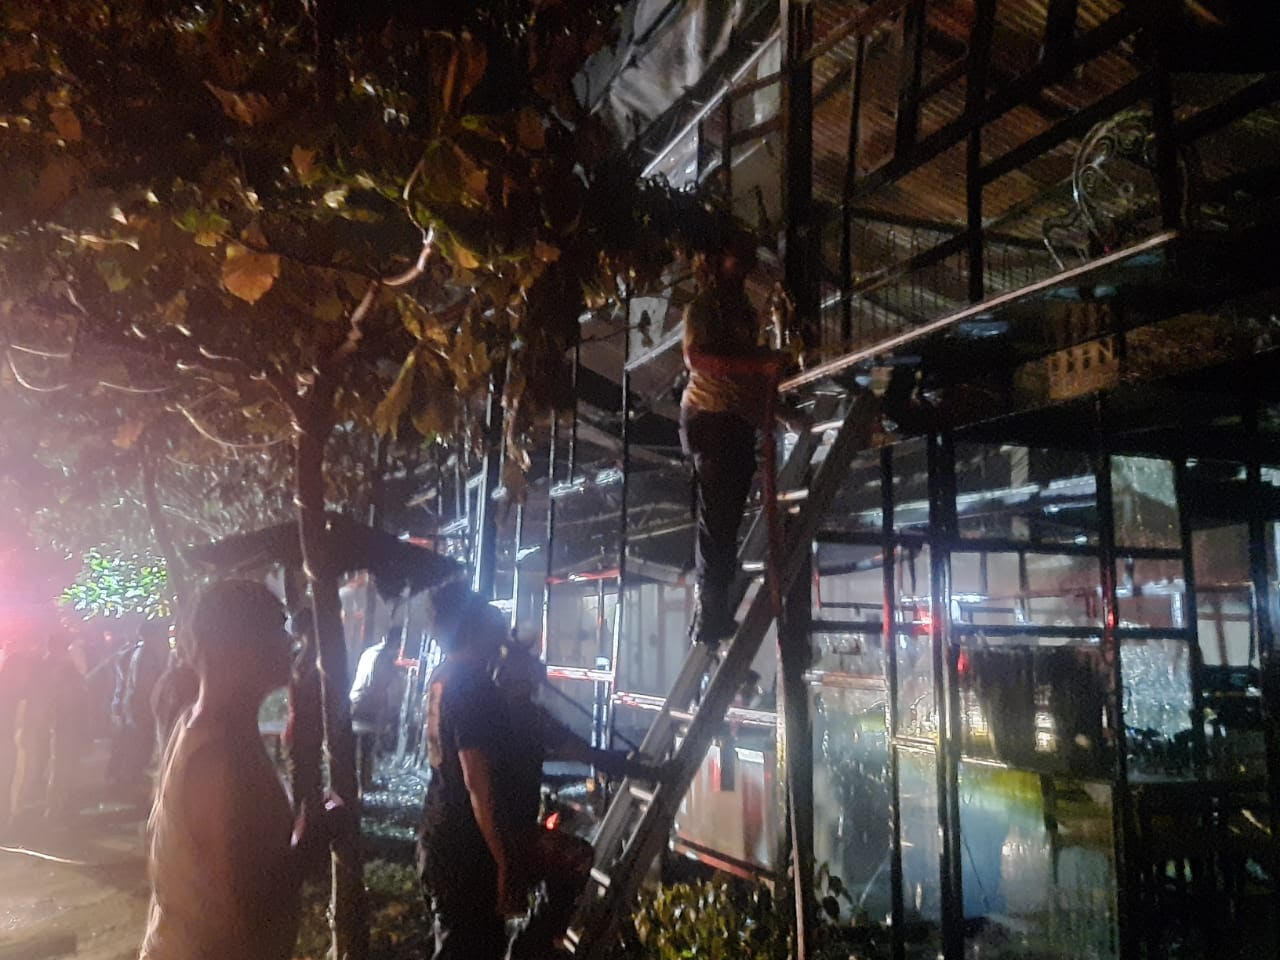 PETUGAS Pemadam Kebakaran Gianyar memadamkan api di Omah Gelato, Jalan Raya Tebongkang, Desa Singakerta, Ubud. Foto: ist